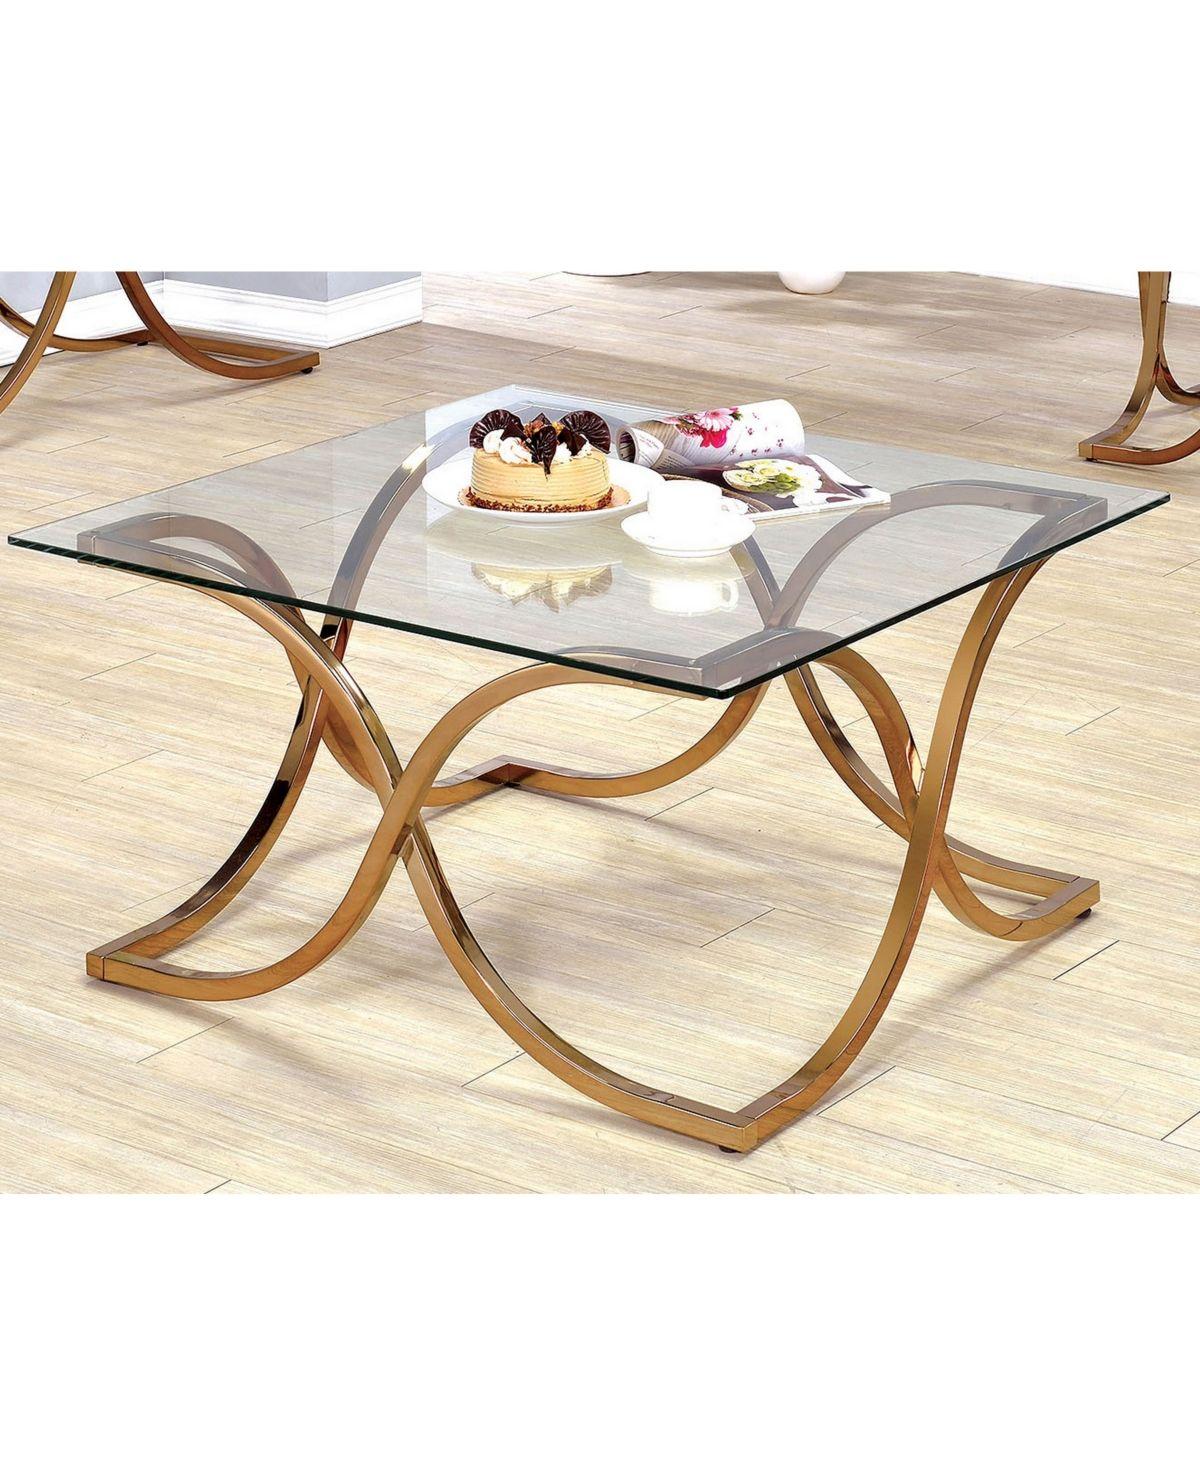 Furniture Of America Sarif Glass Top Coffee Table Reviews Home Macy S Coffee Table Coffee Table Setting Furniture Of America [ 1467 x 1200 Pixel ]